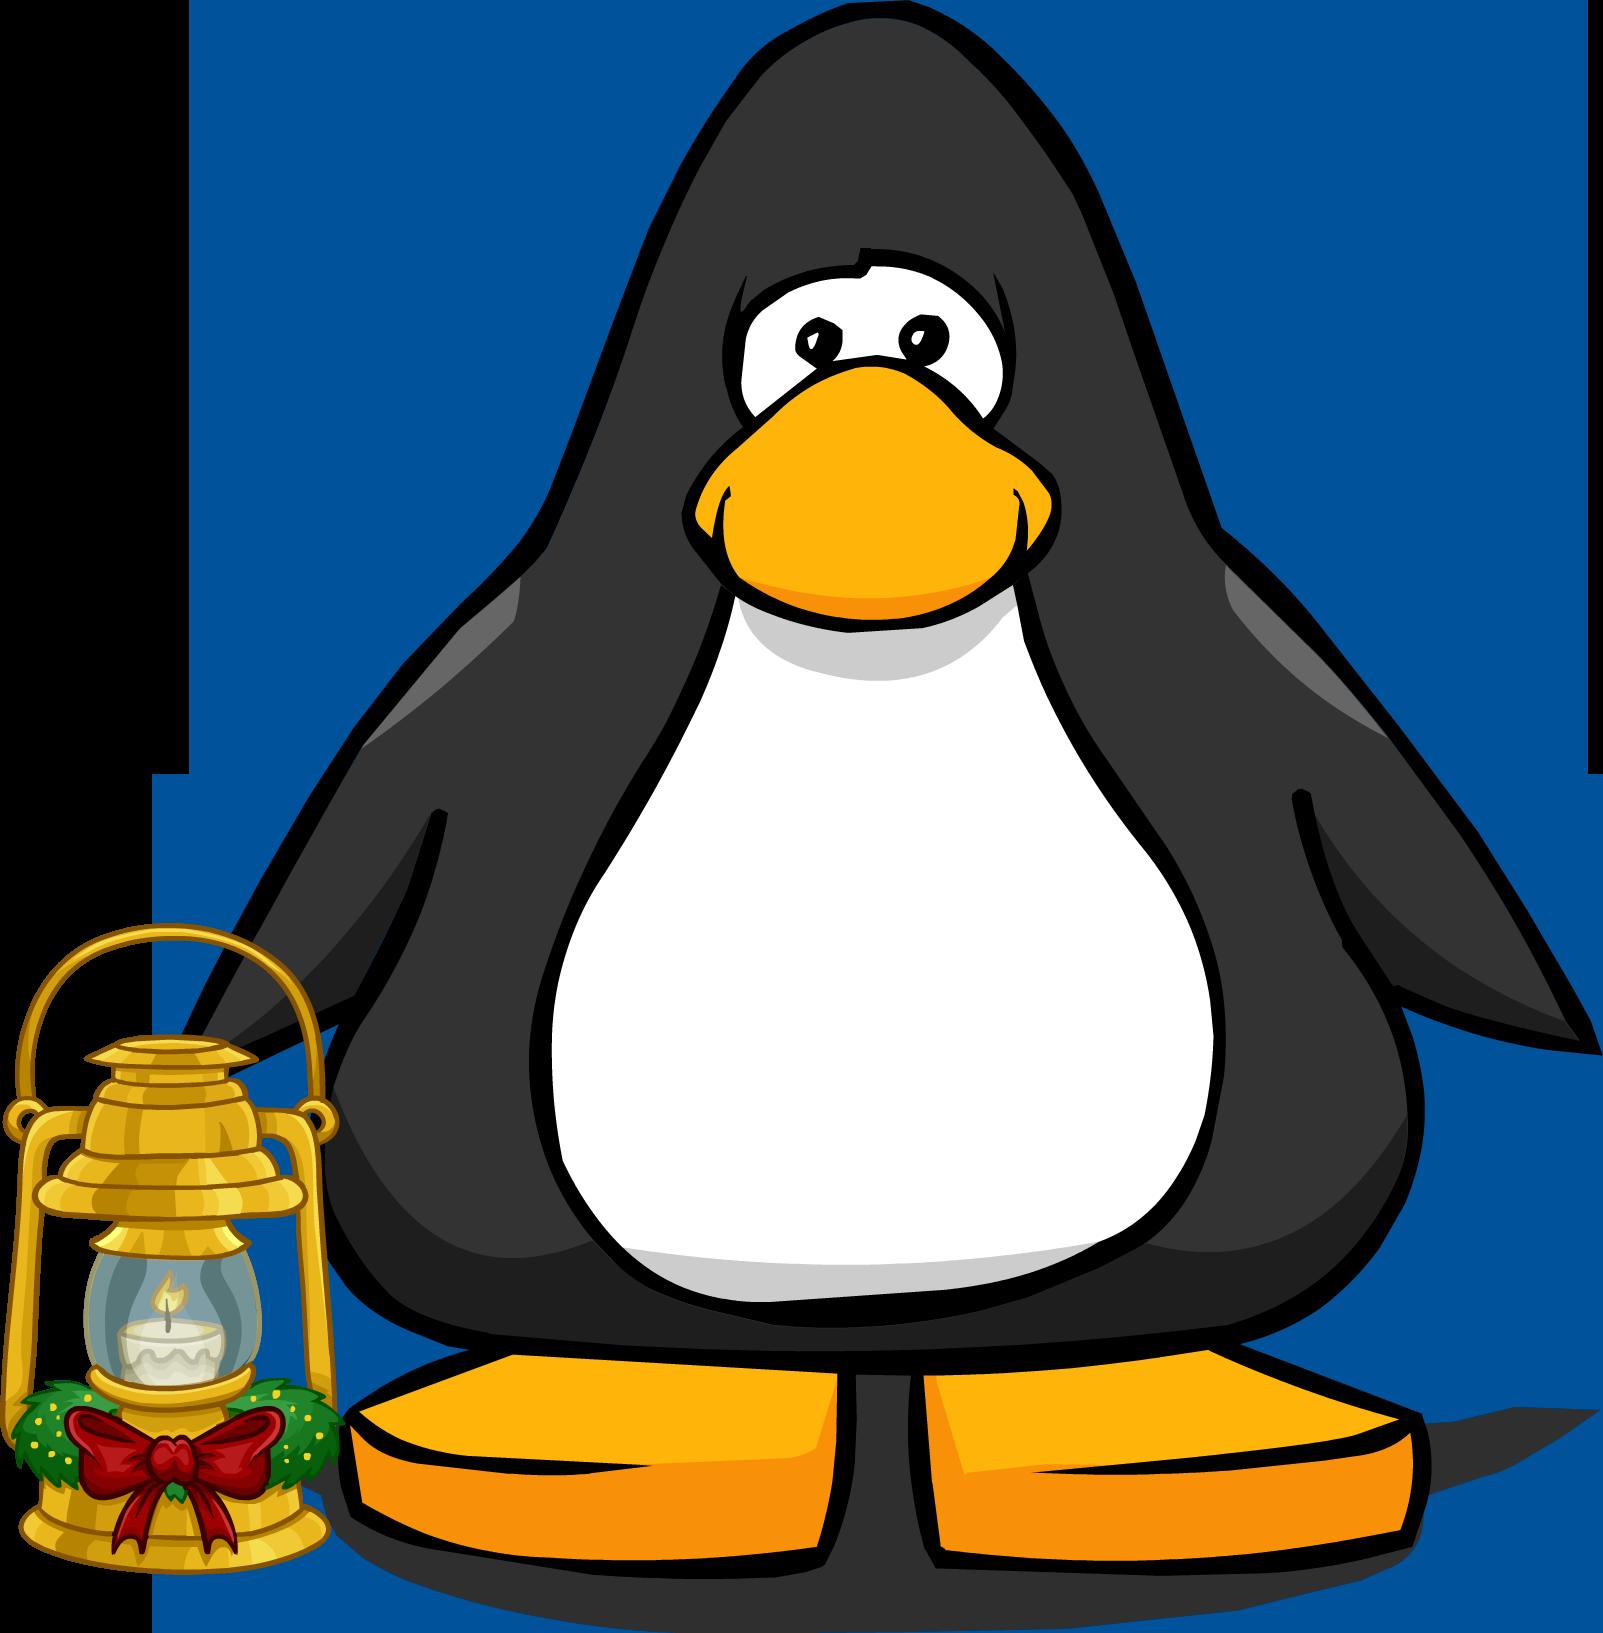 File:Holiday Lantern PC.png